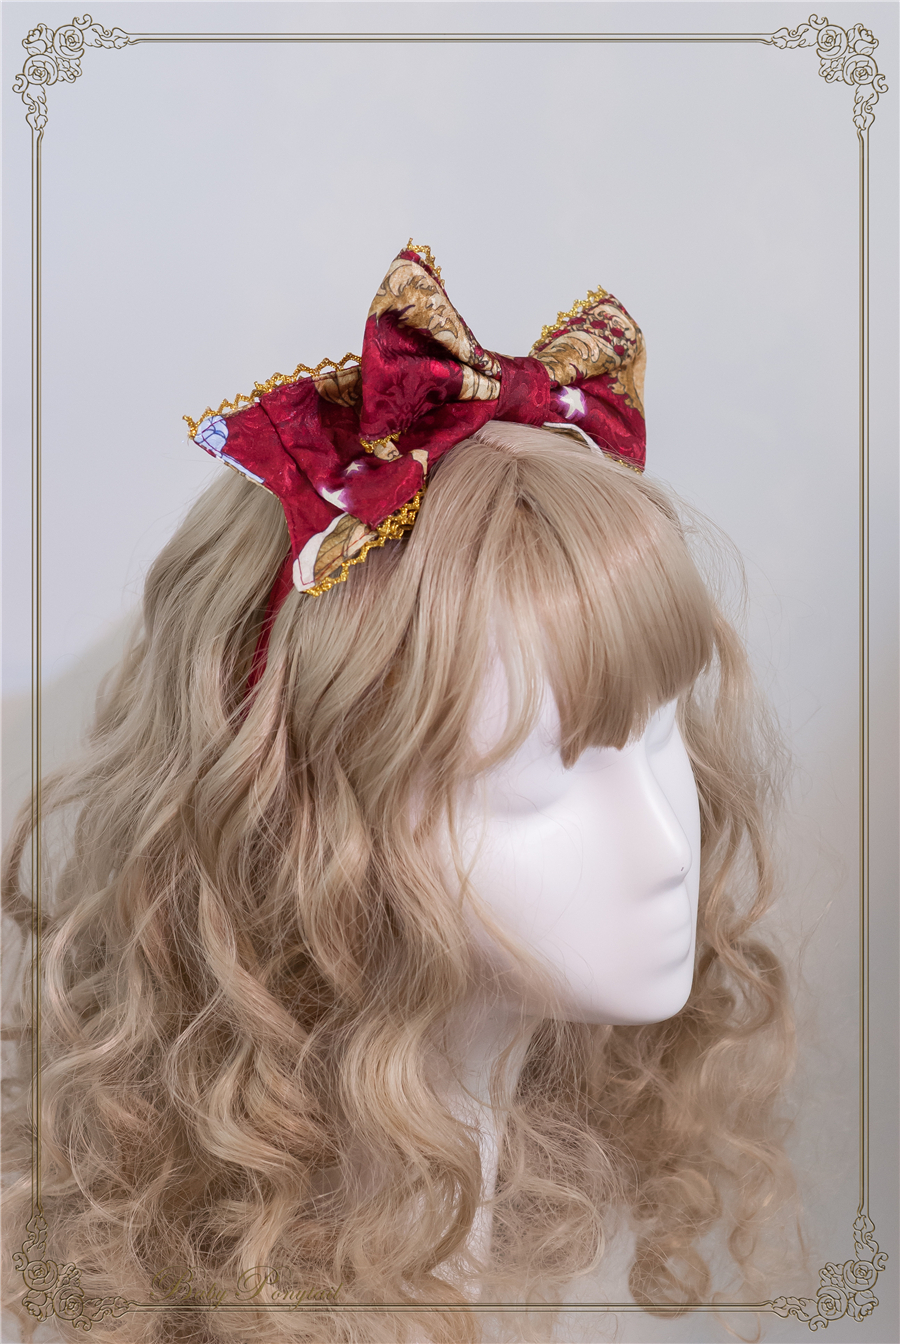 Baby Ponytail_Stock photo_Circus Princess_KC Red_03.jpg